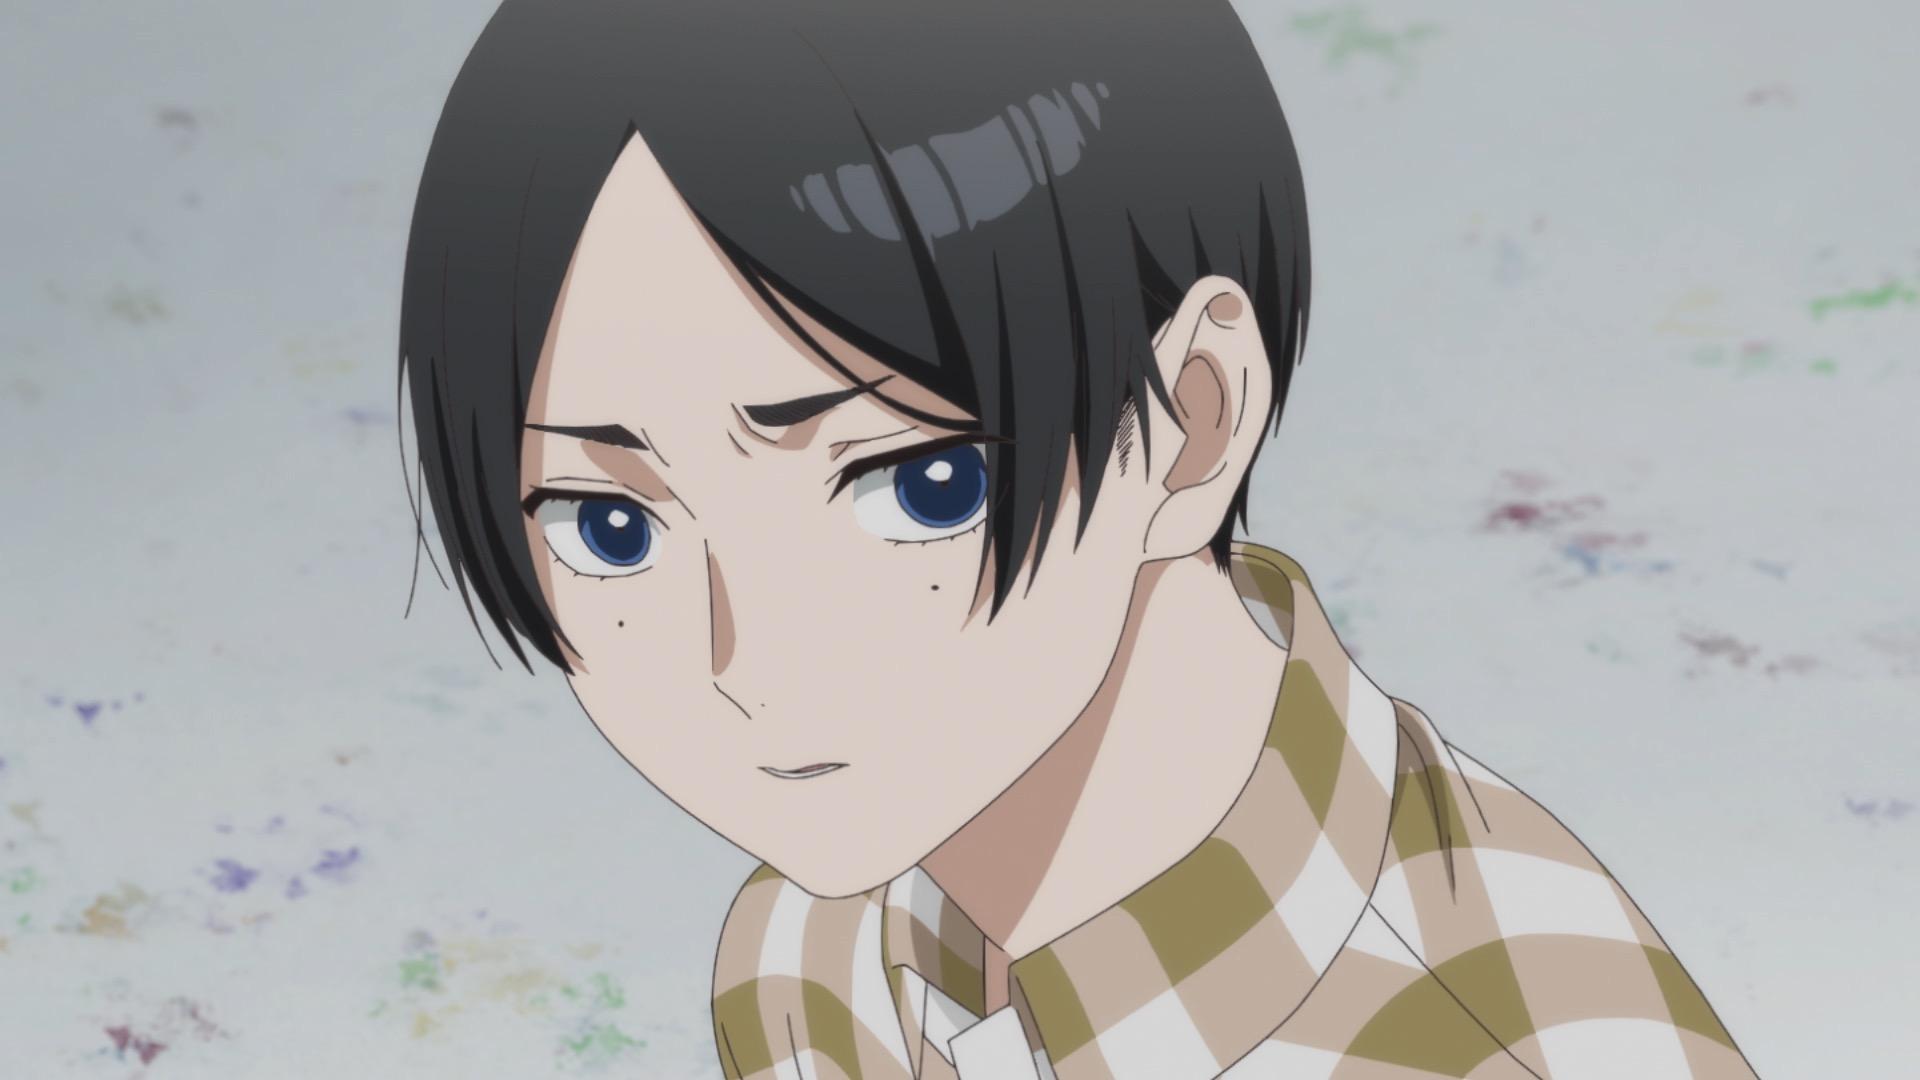 TVアニメ「ブルーピリオド」高橋世田介